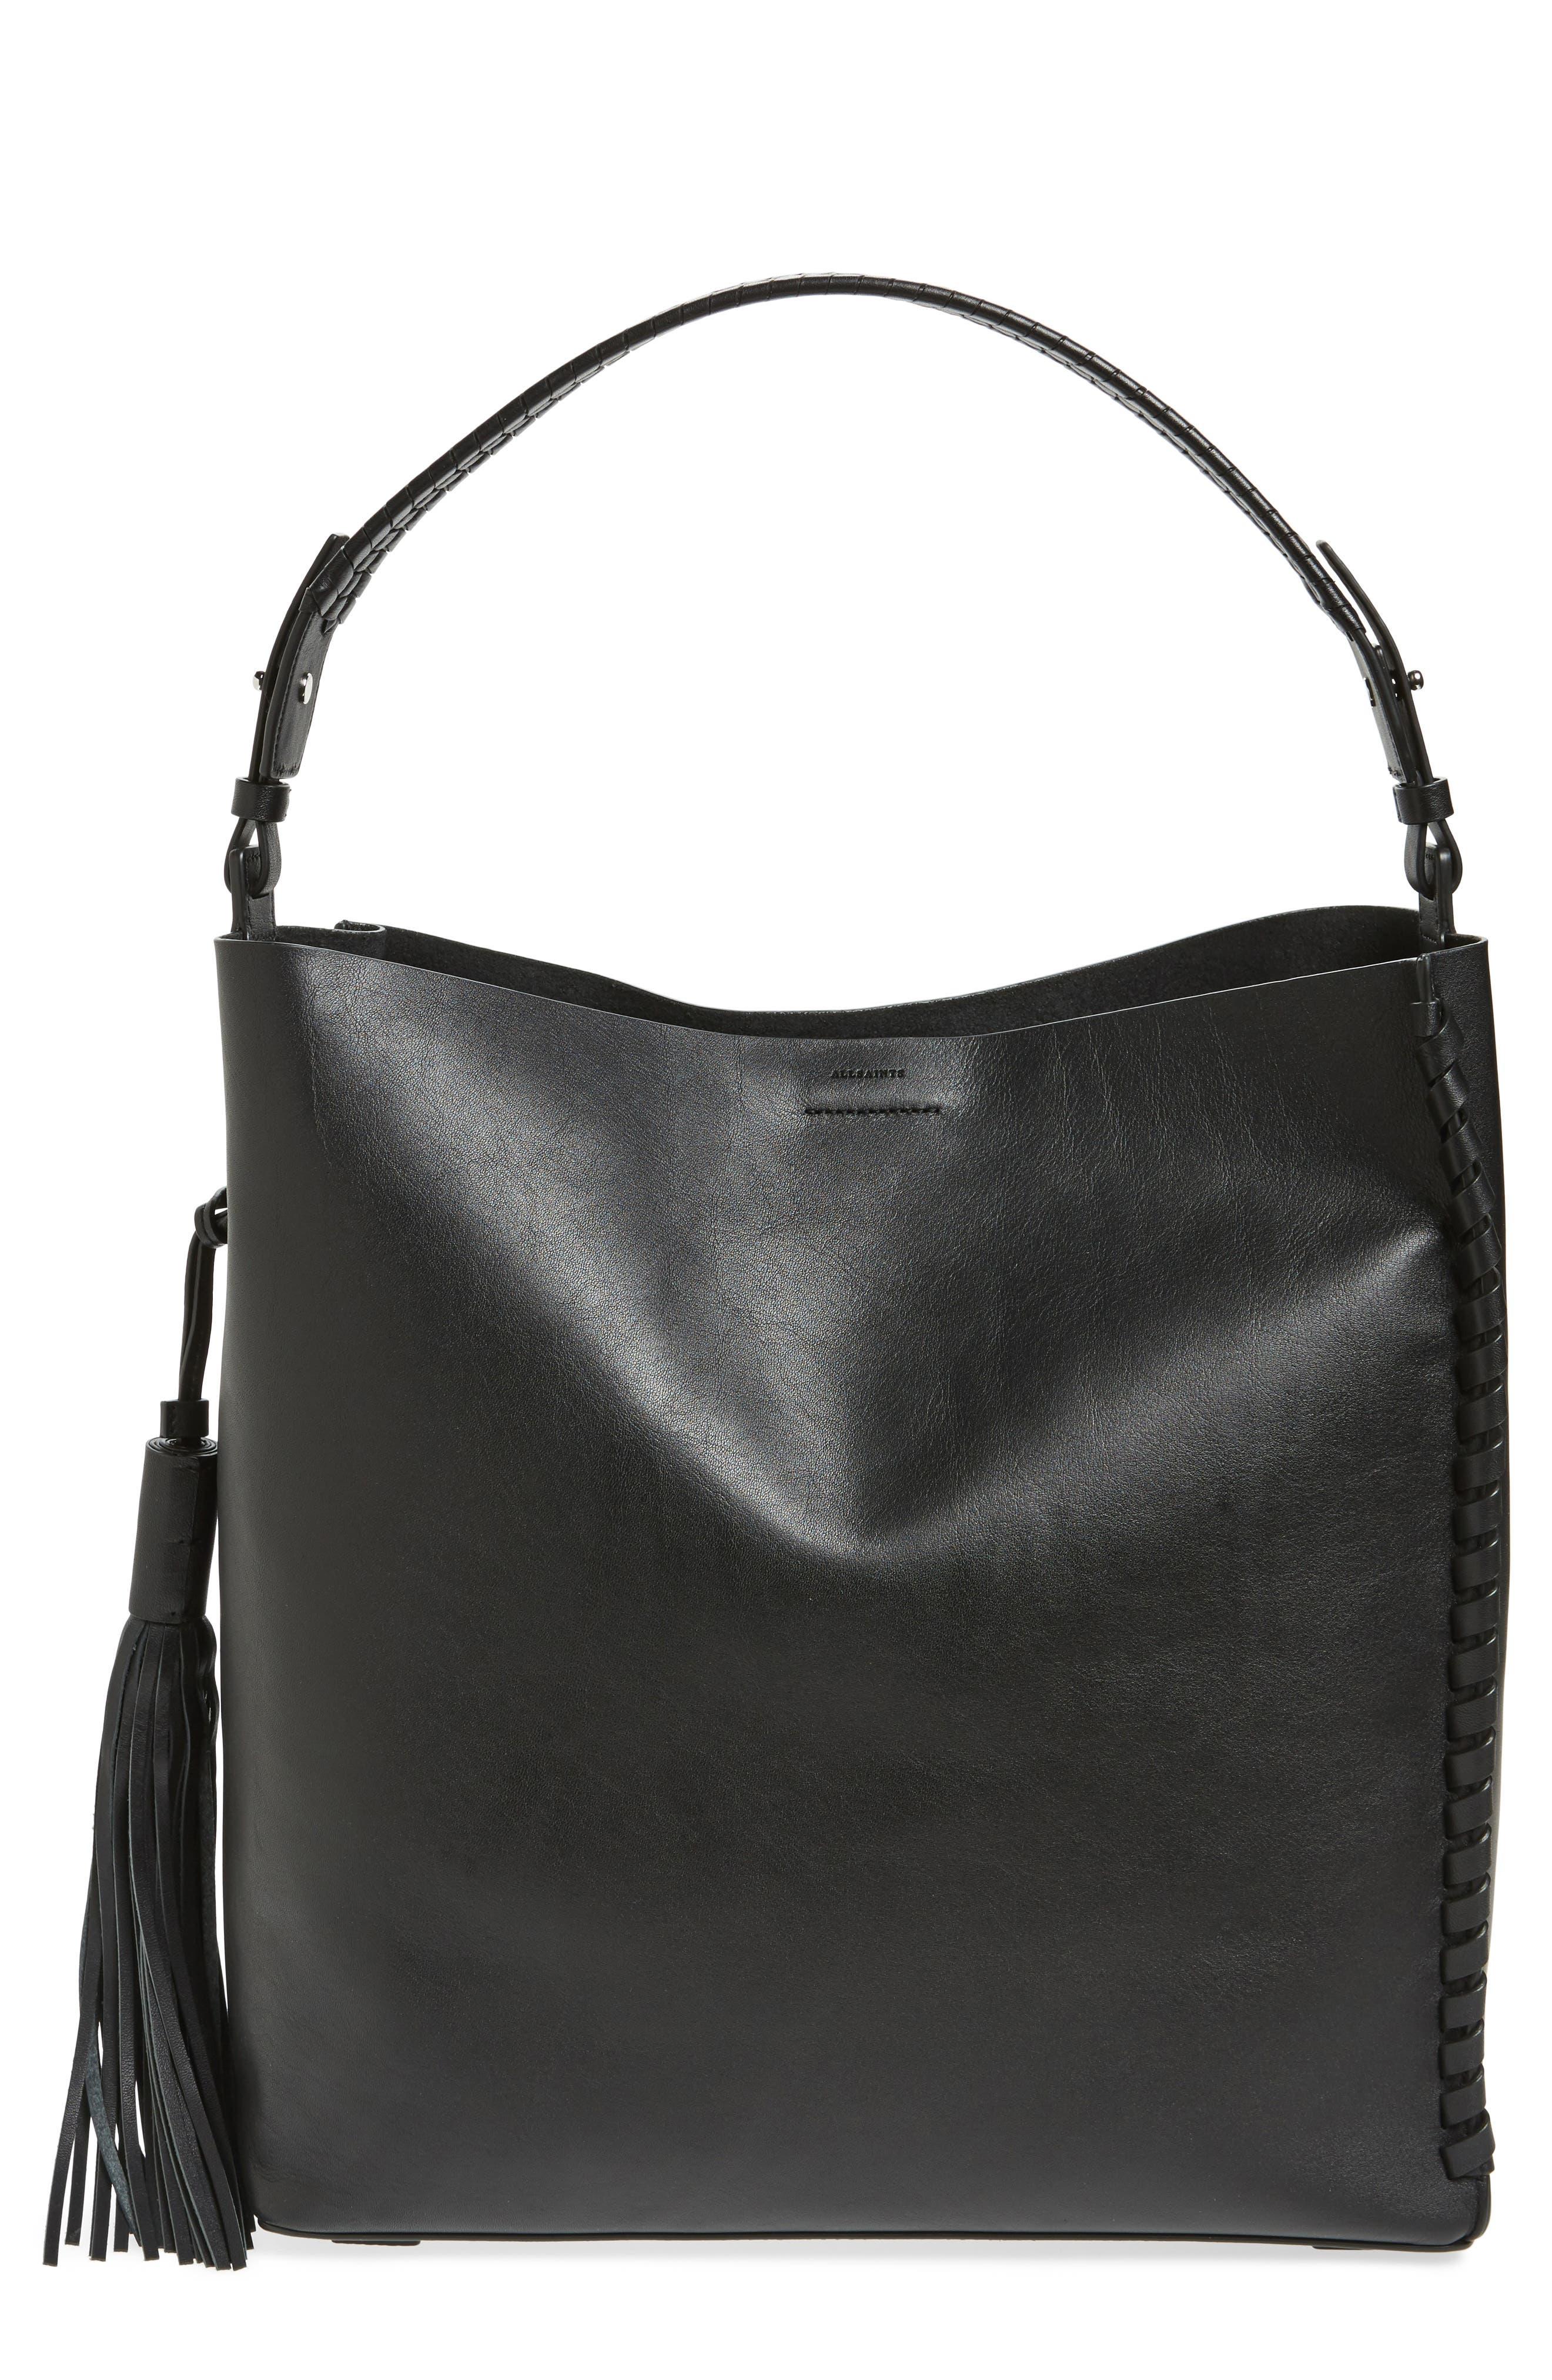 Kepi North/South Leather Tote,                         Main,                         color, Black